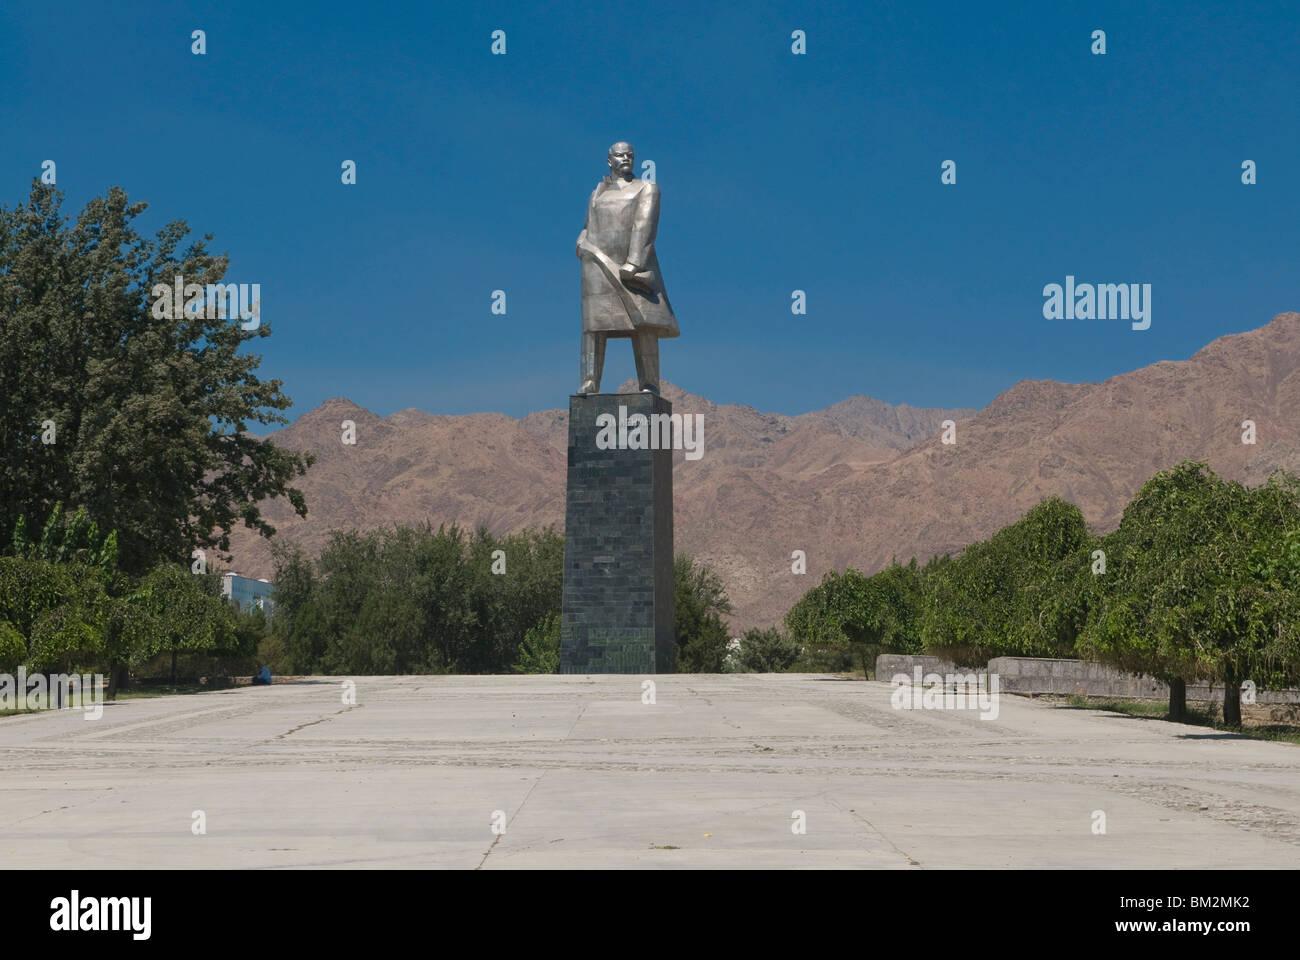 Statue of Lenin, Communism, Khojand, Tajikistan - Stock Image